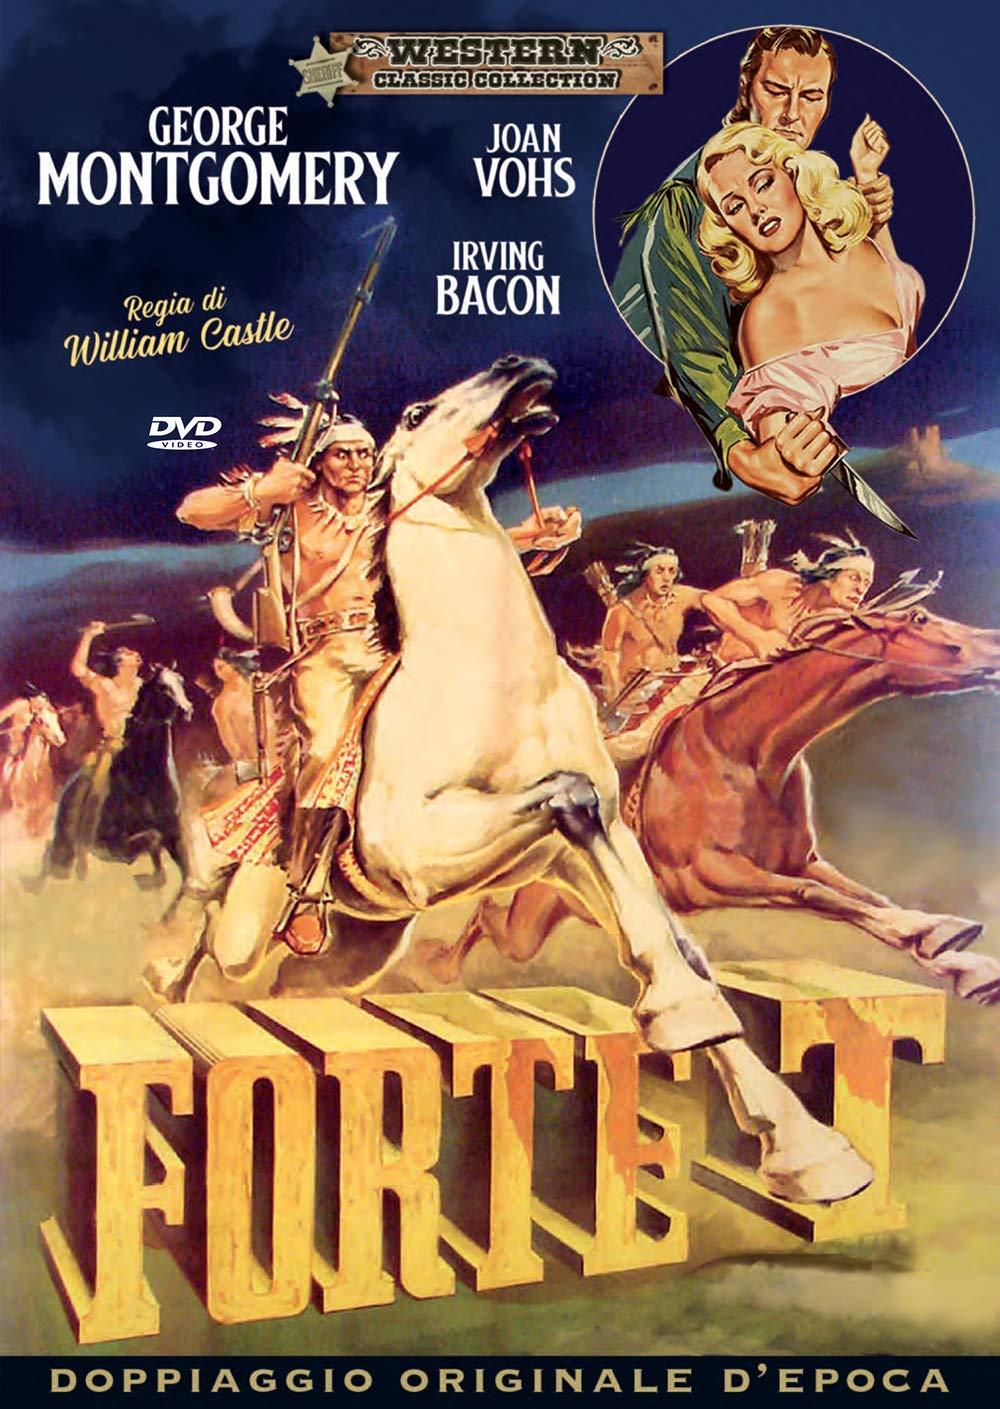 FORTE T (DVD)